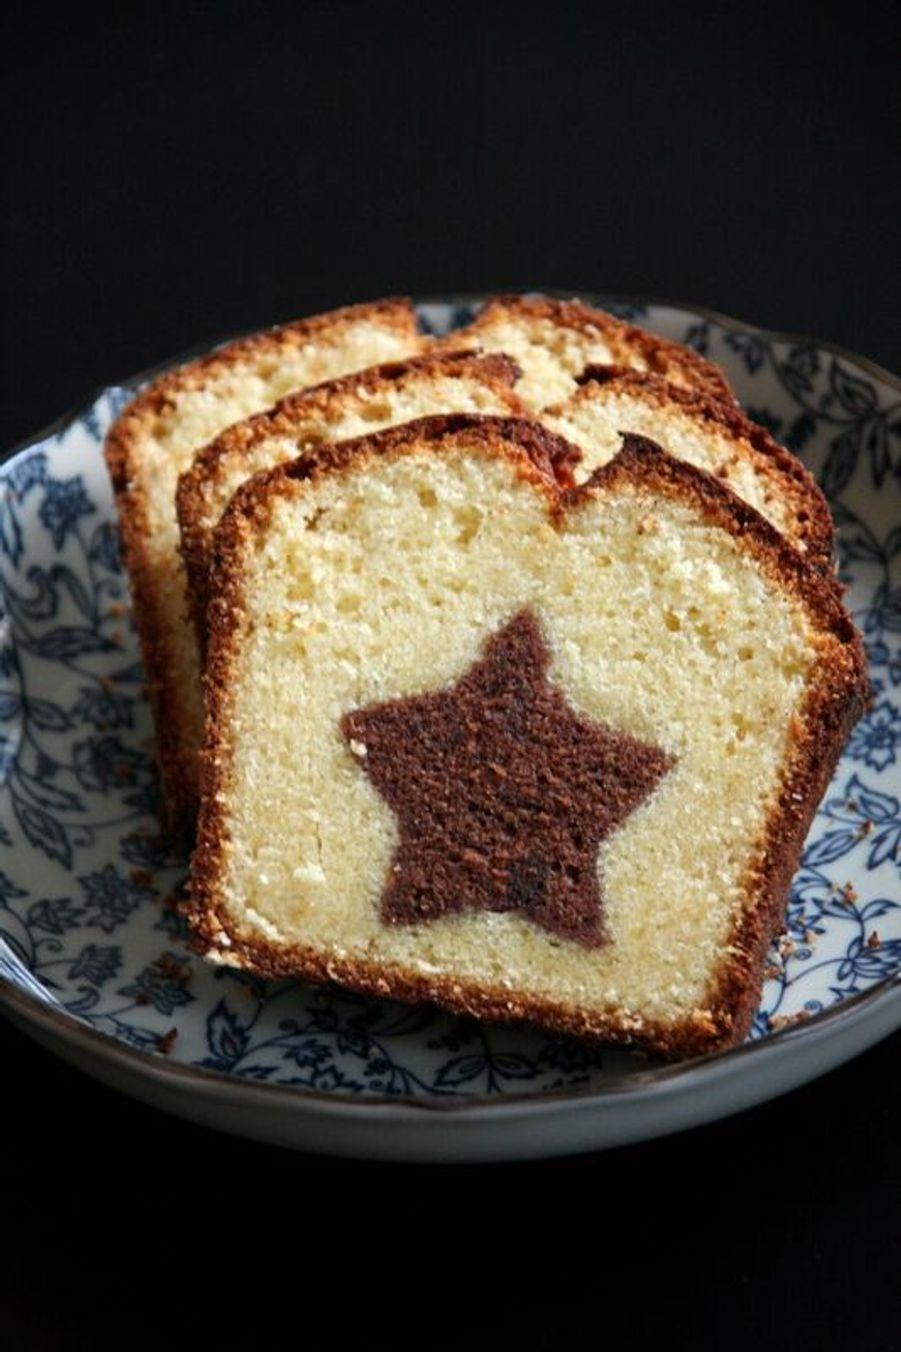 Gâteau avec étoile https://www.pinterest.fr/pin/404057397793354494/